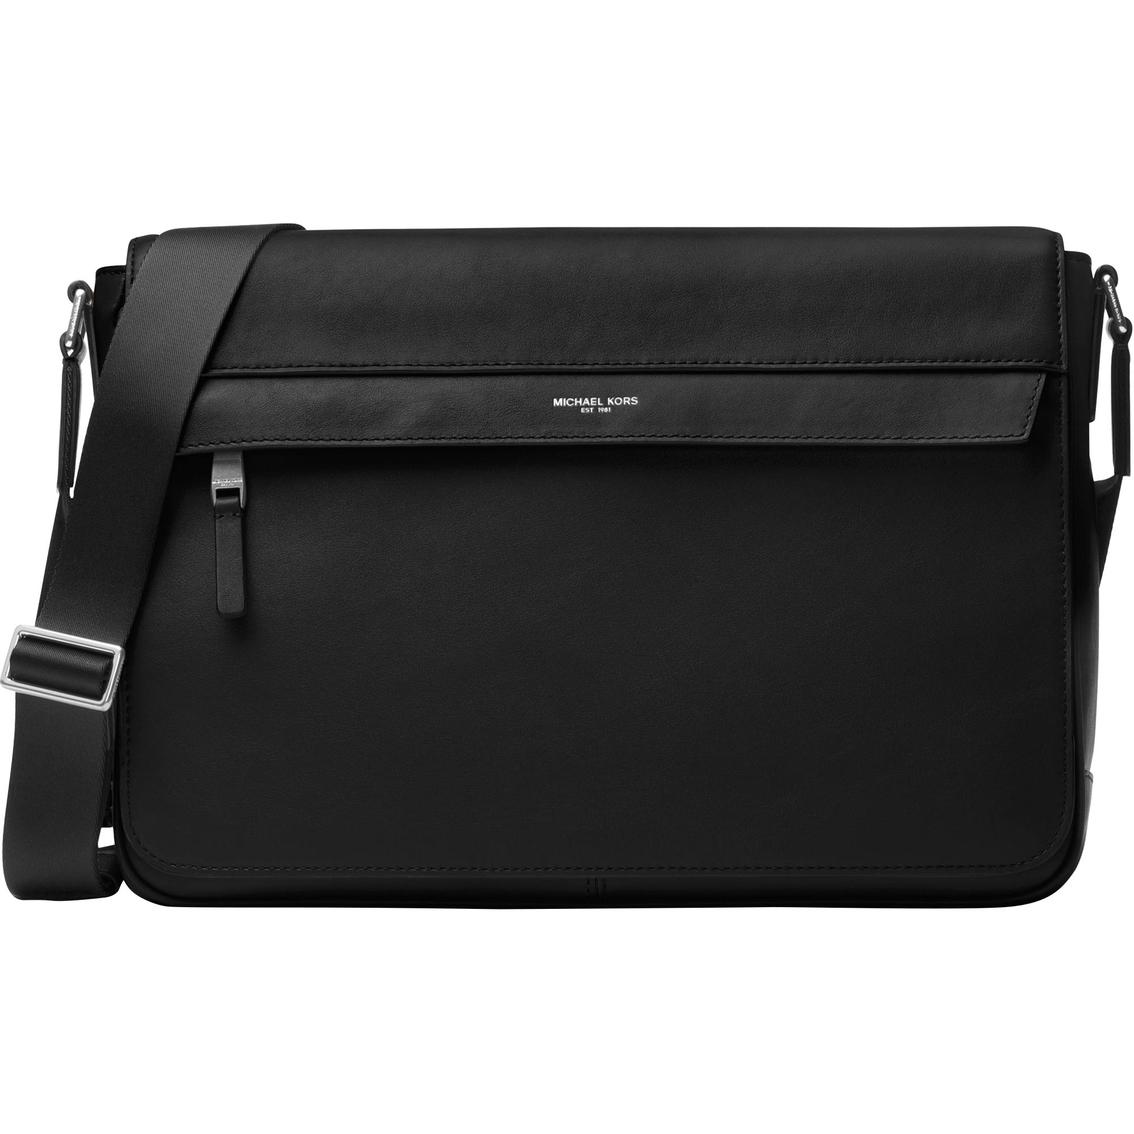 4c6c653970bf Michael Kors Odin Resina Large Messenger Bag